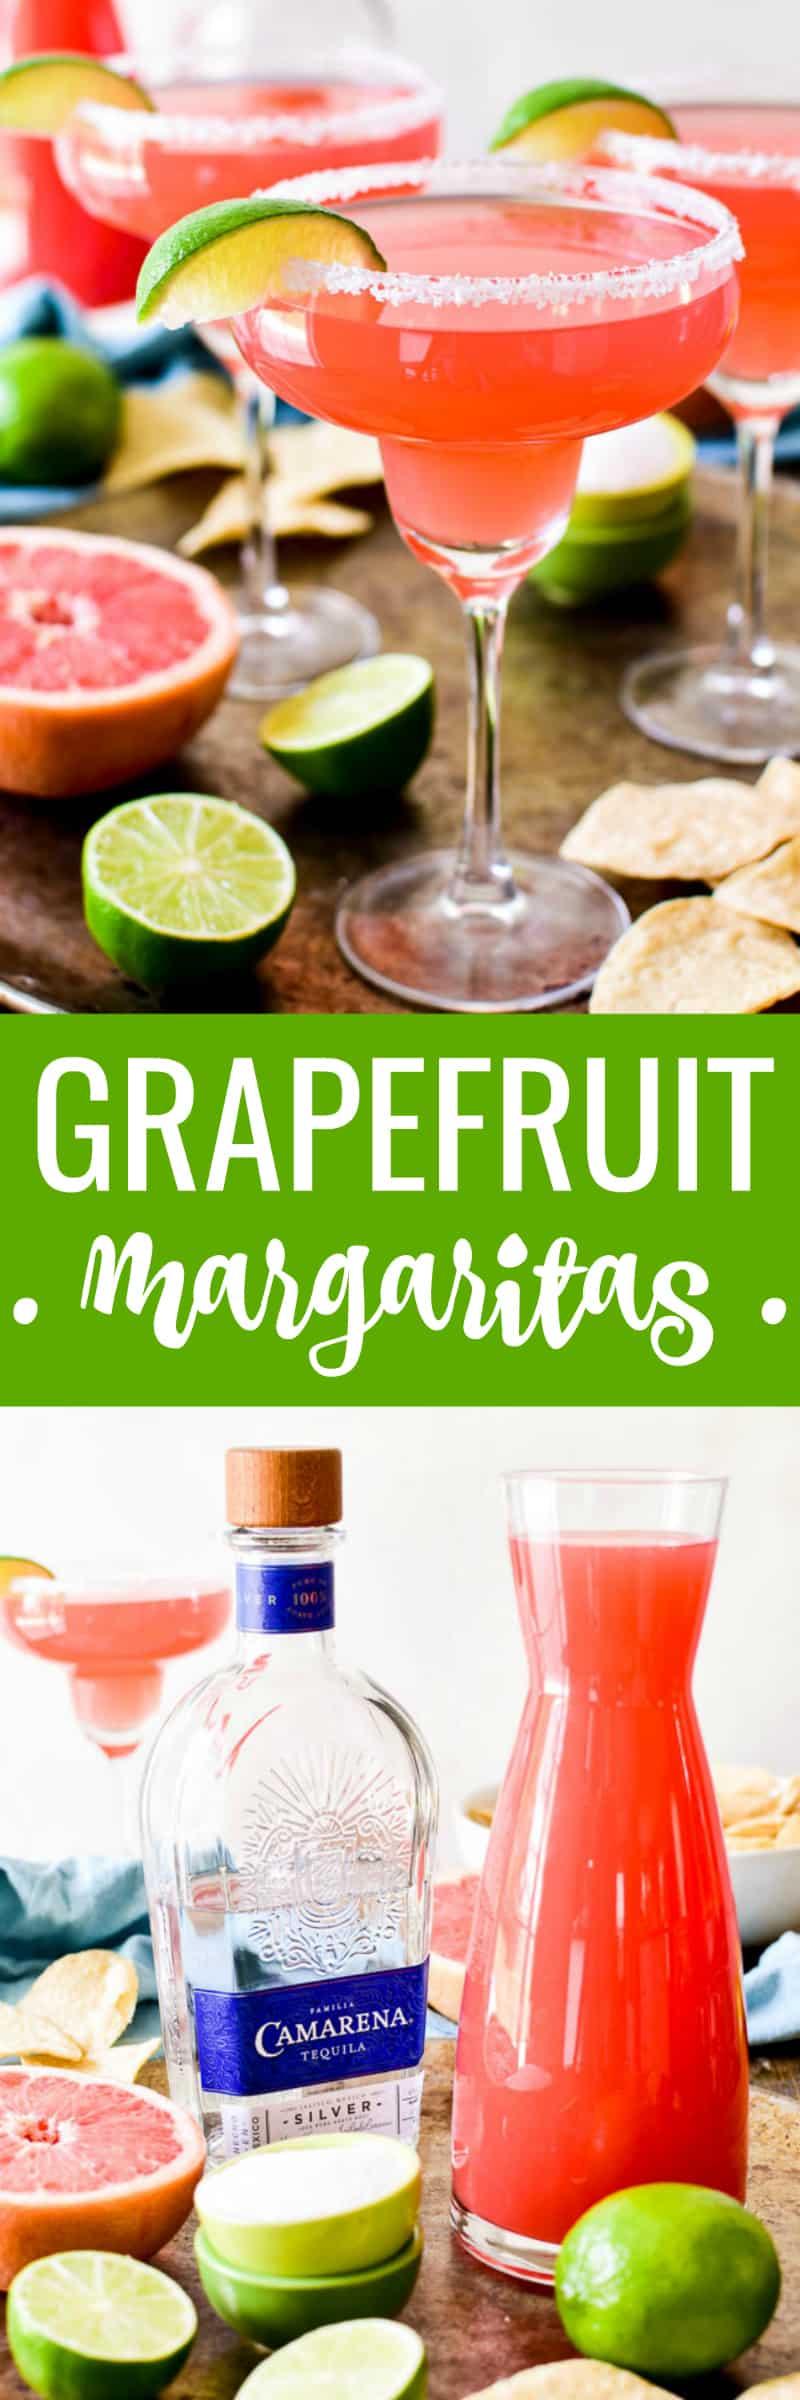 Collage image of Grapefruit Margaritas